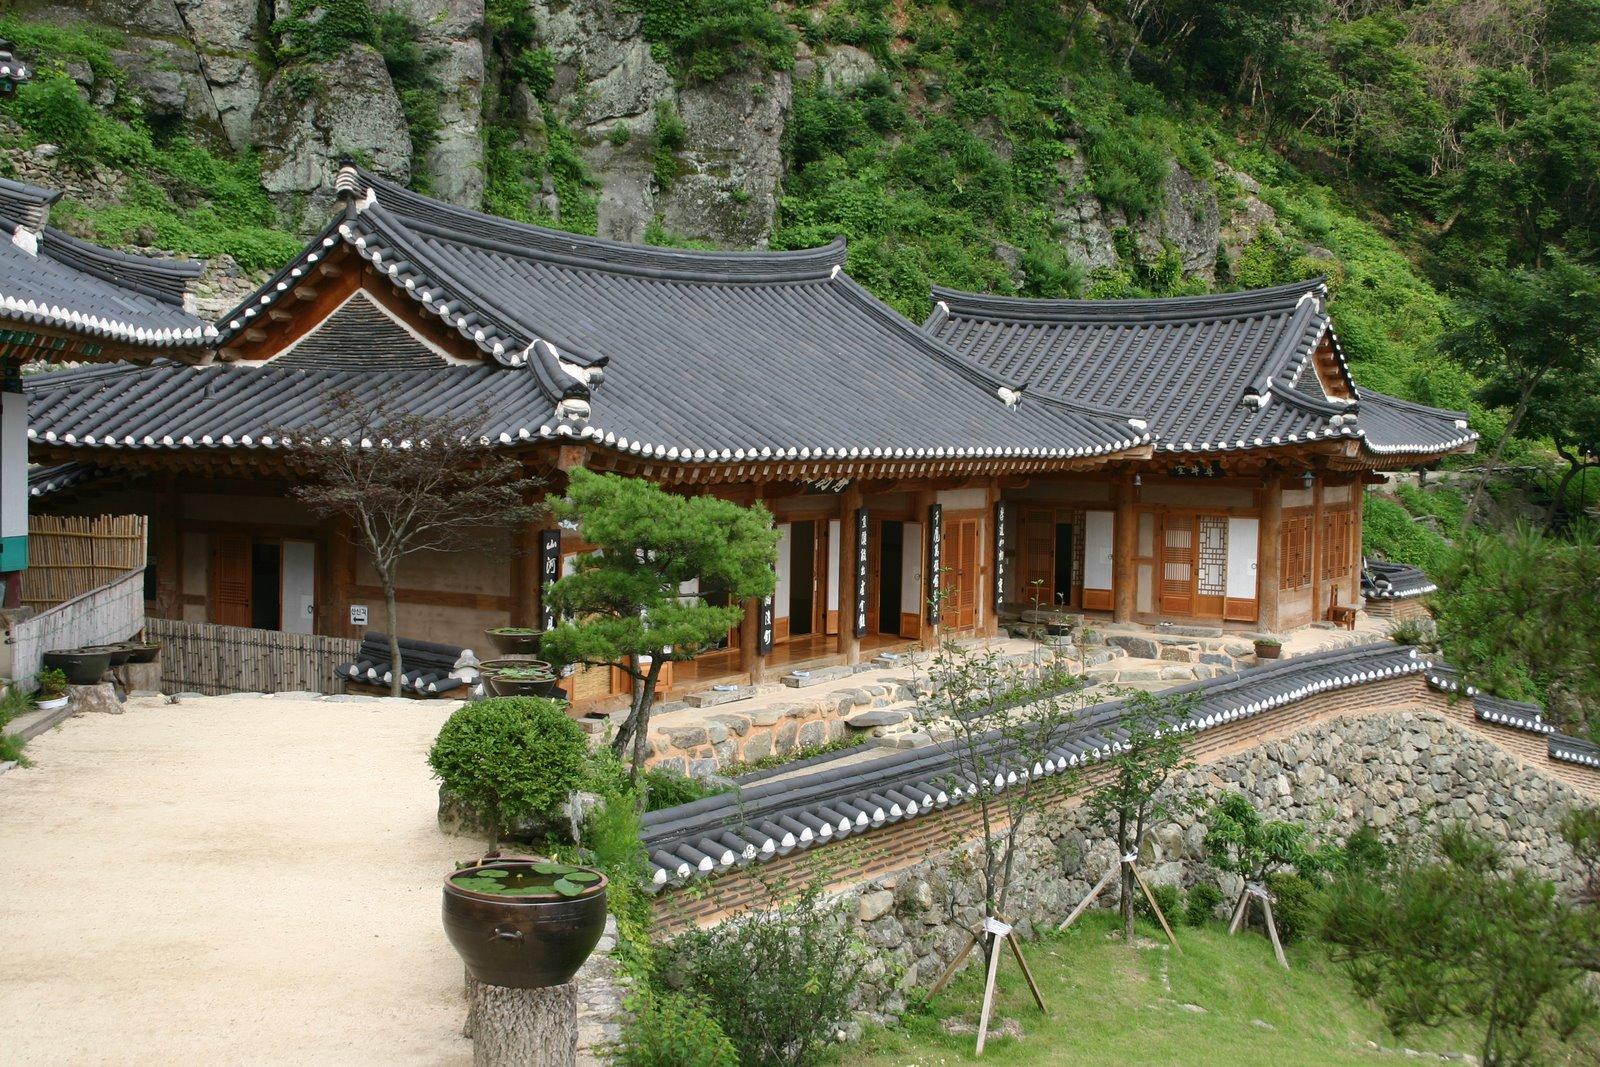 Maria margareta hanok the korean house - Mansions in south korea ...